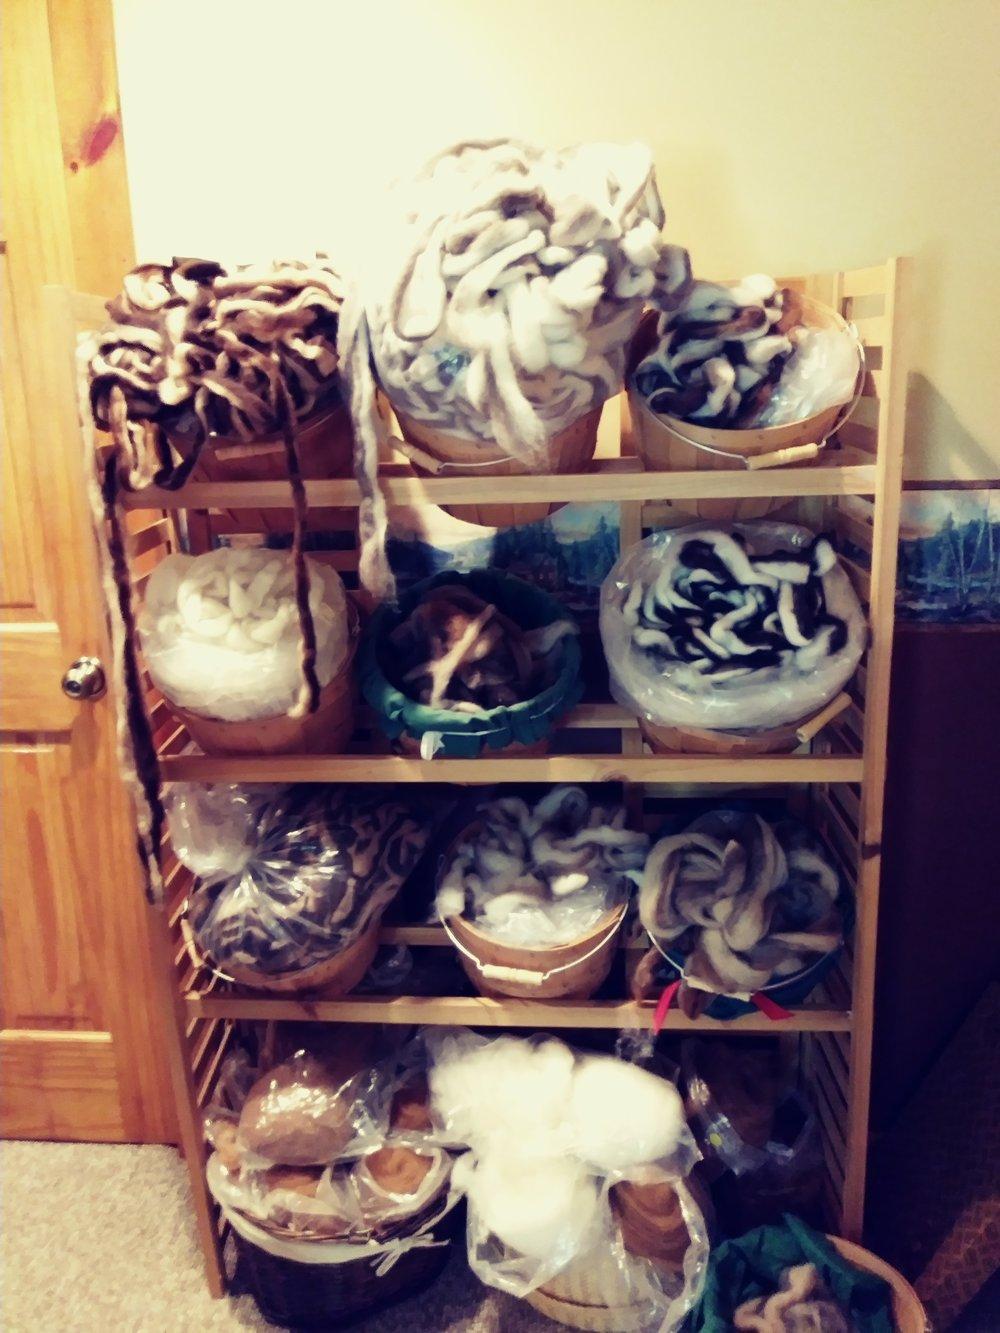 Baskets of Alpaca Roving